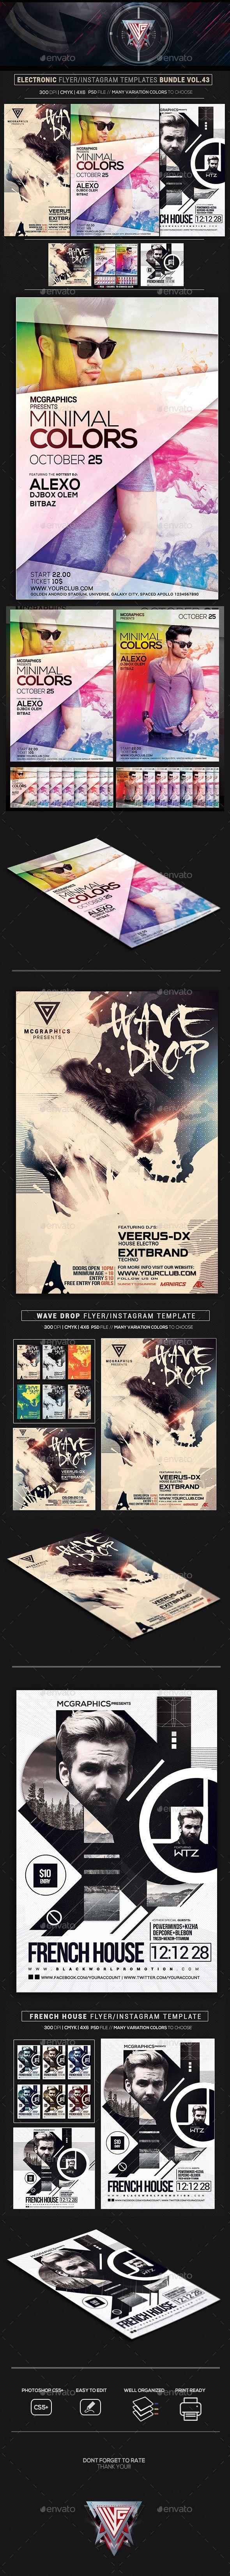 Electro Music #Flyer/Instagram Bundle Vol. 44 - Print #Templates Download here: https://graphicriver.net/item/electro-music-flyerinstagram-bundle-vol-44/20272460?ref=alena994